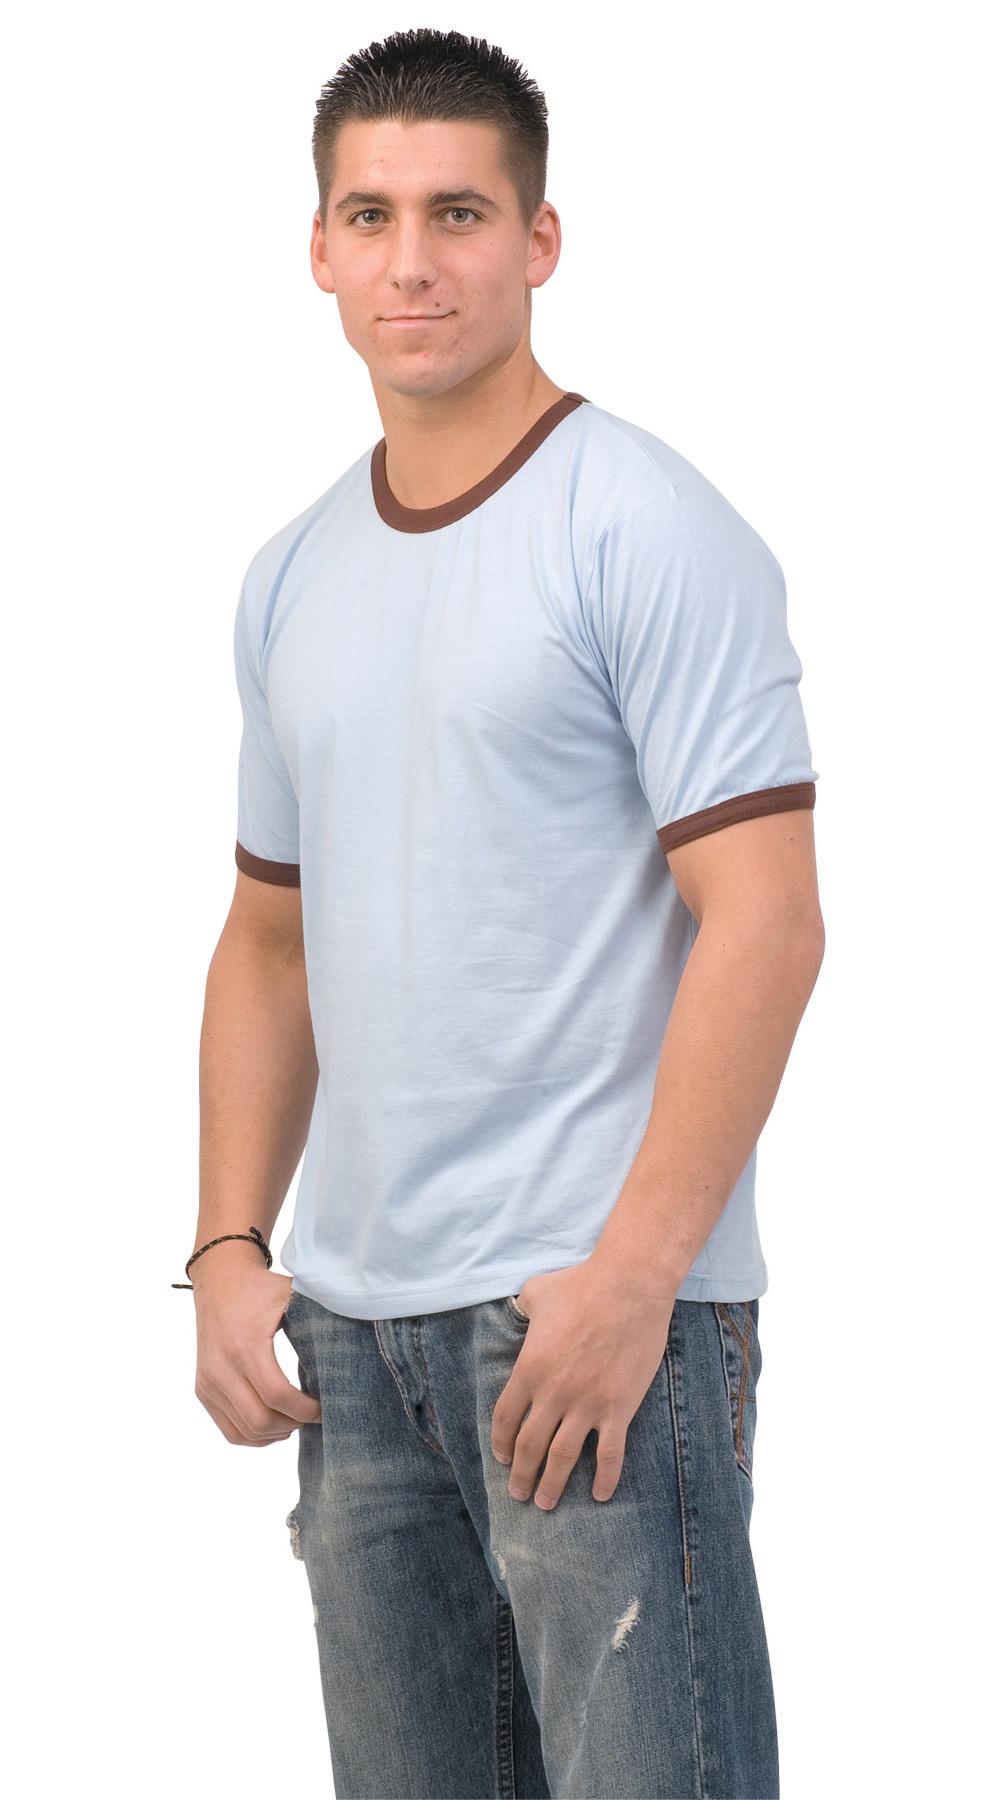 Monag 543020 - Short Sleeve Ringer Tee